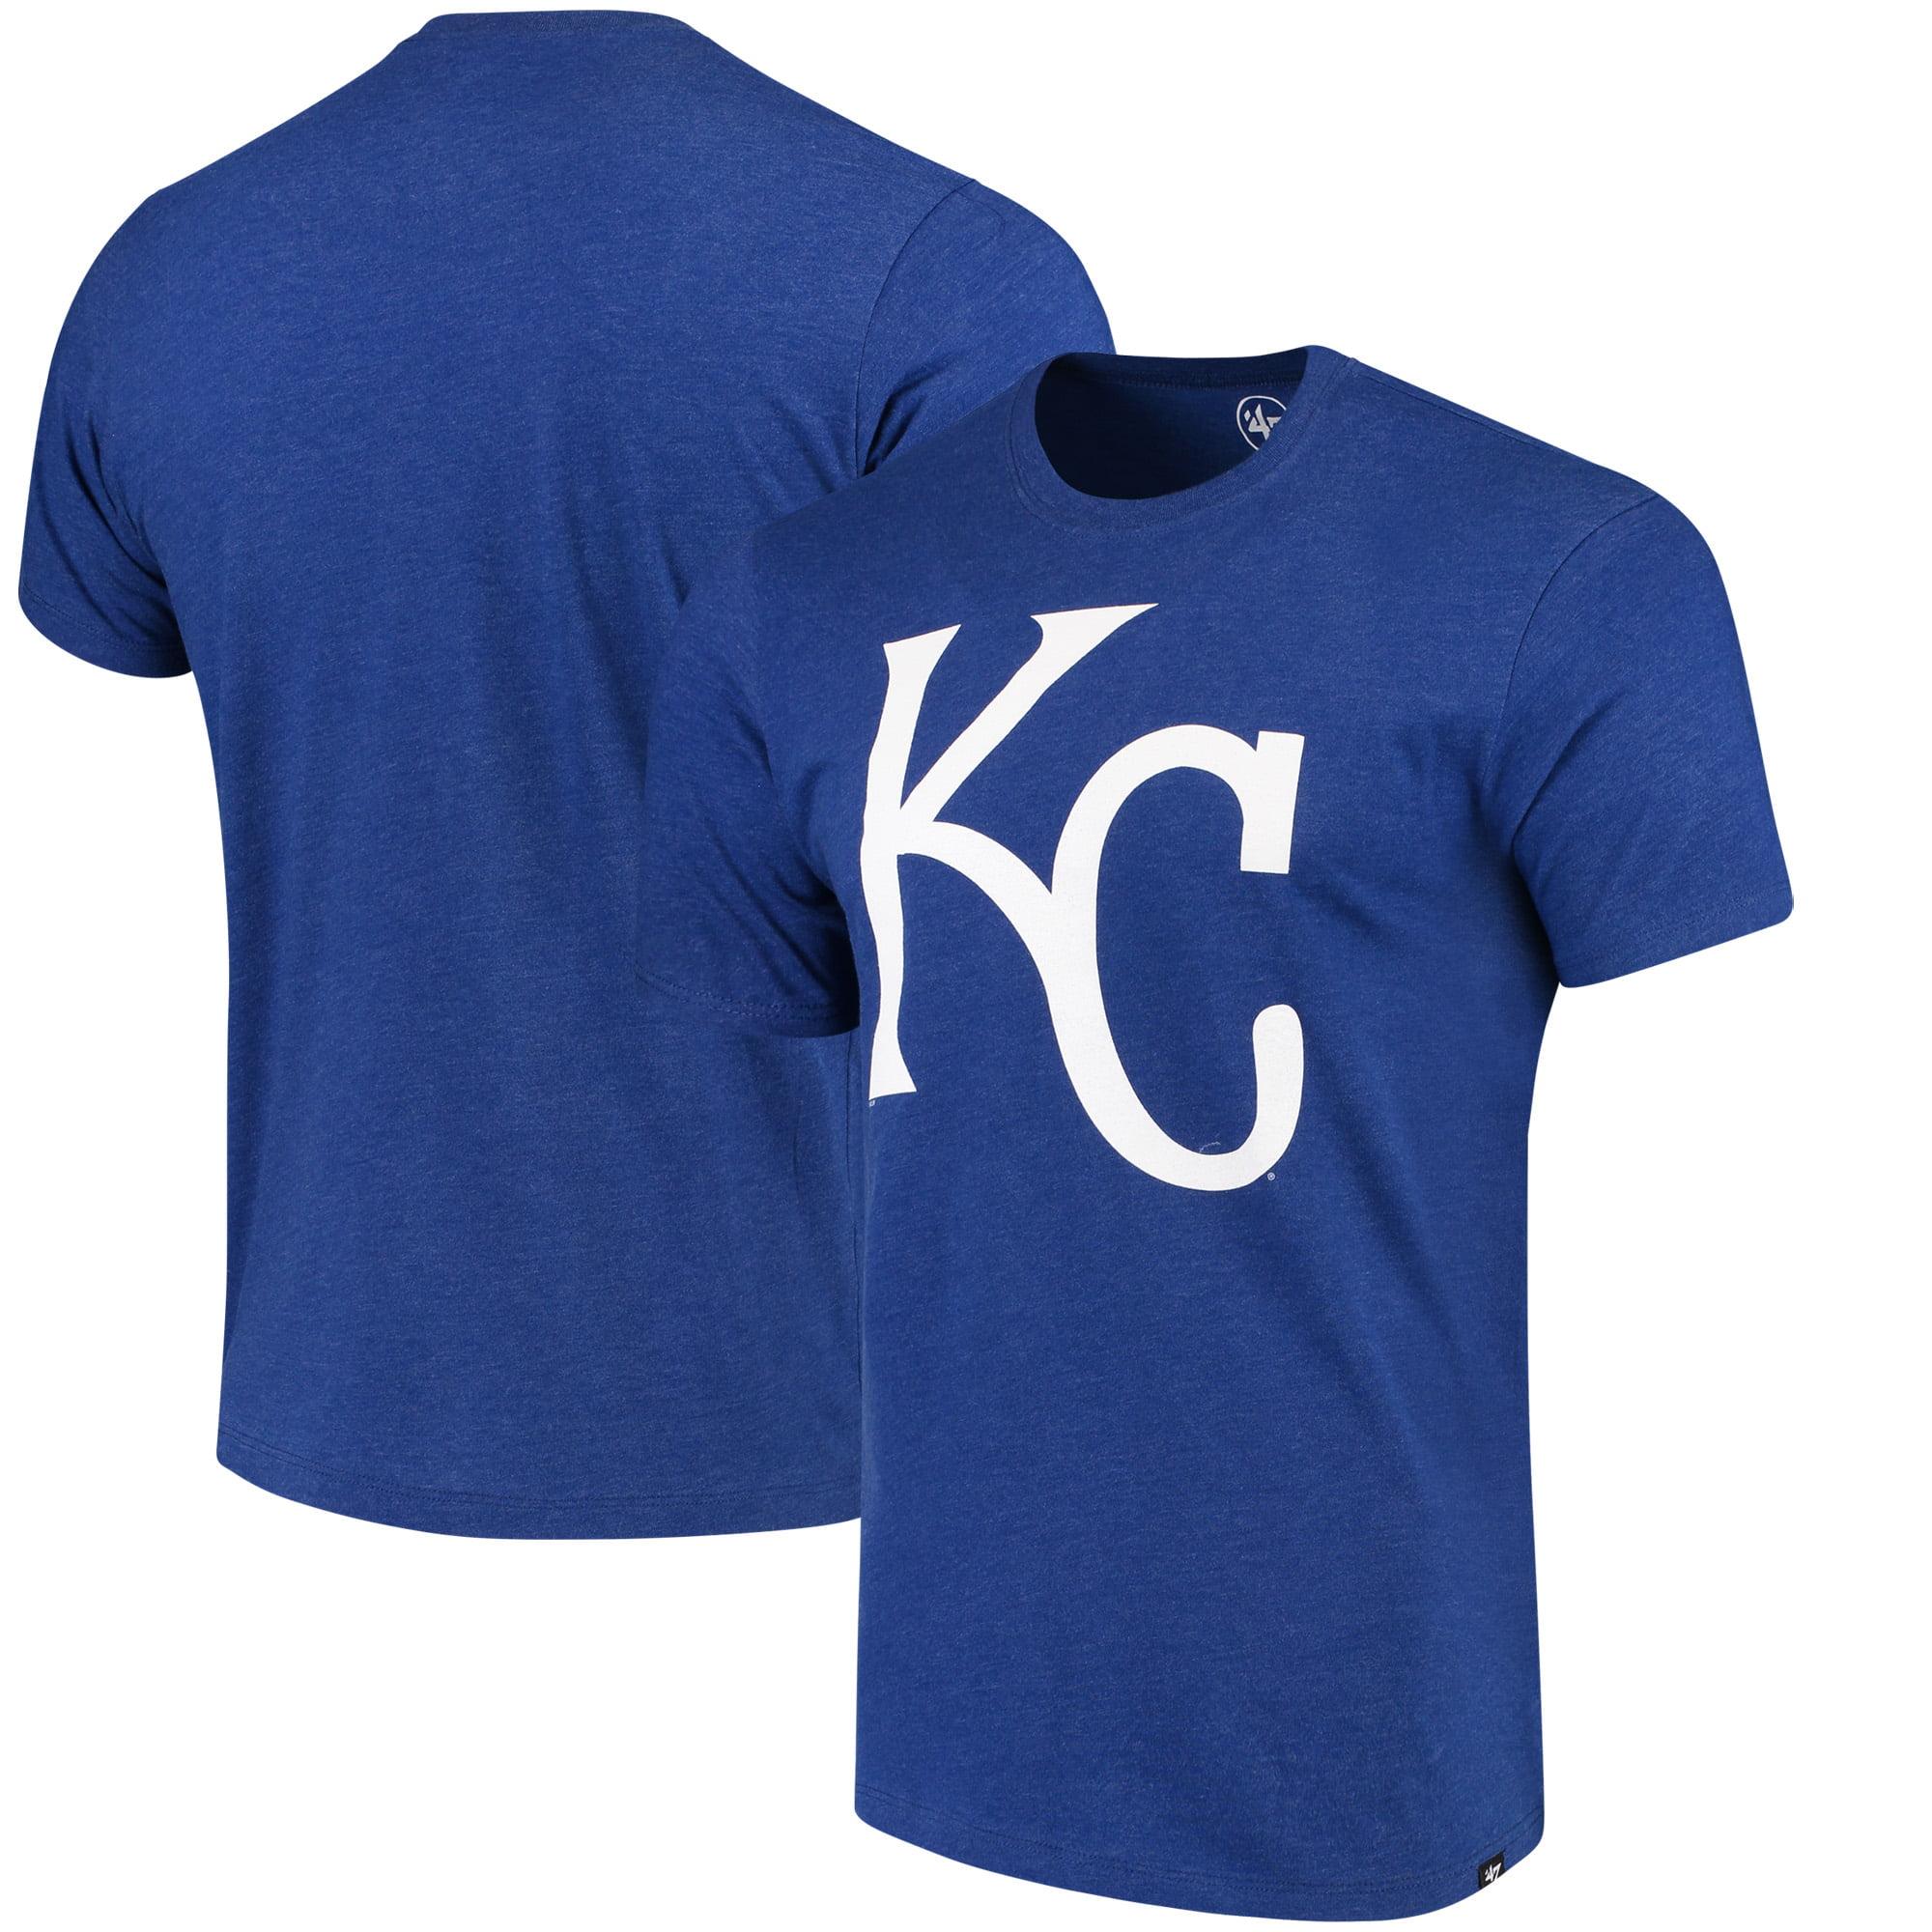 Kansas City Royals '47 Club T-Shirt - Royal